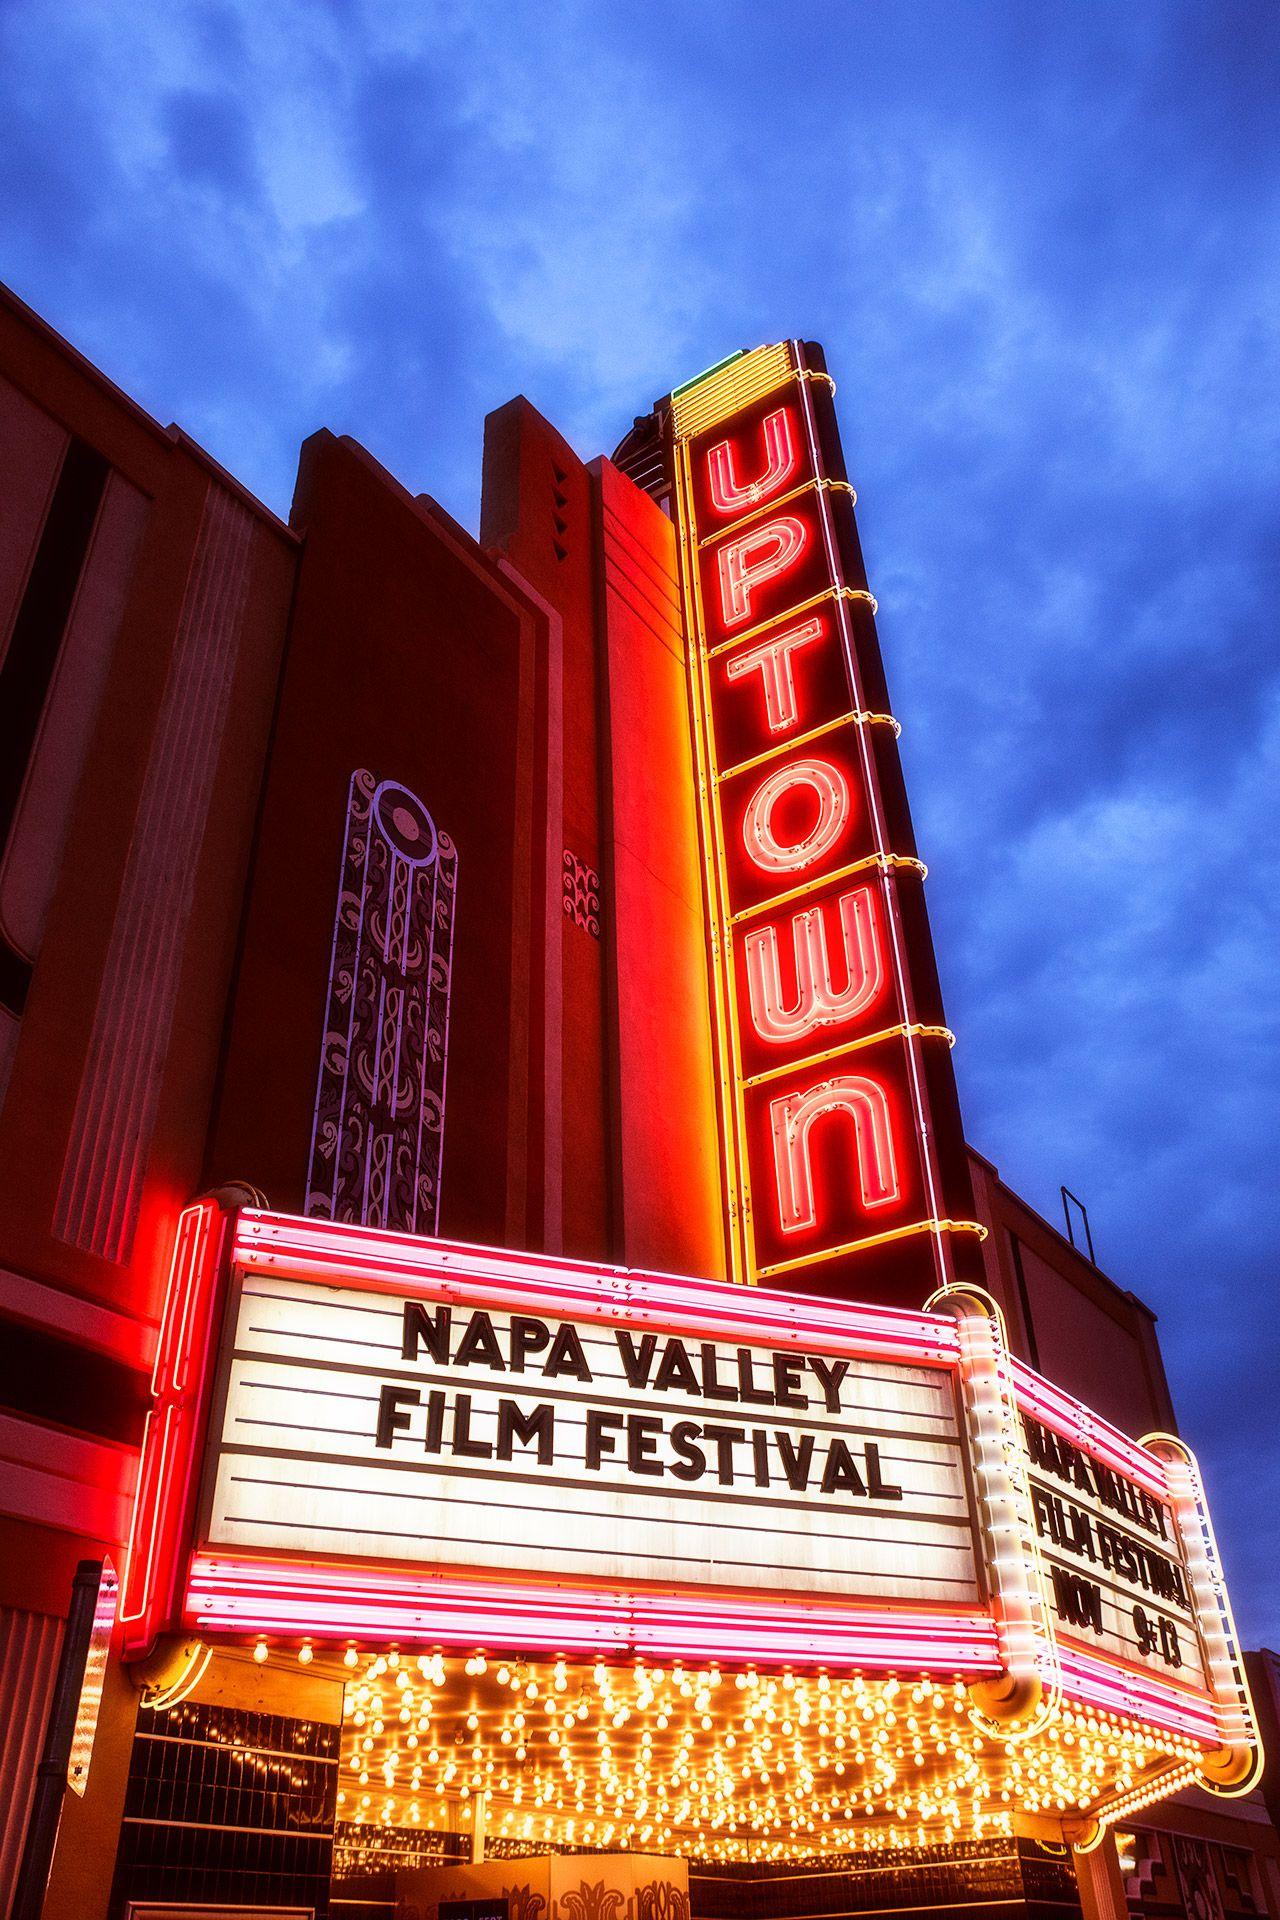 Napa Valley Film Festival With Charles Krug Winery Napa Valley Napa Film Festival